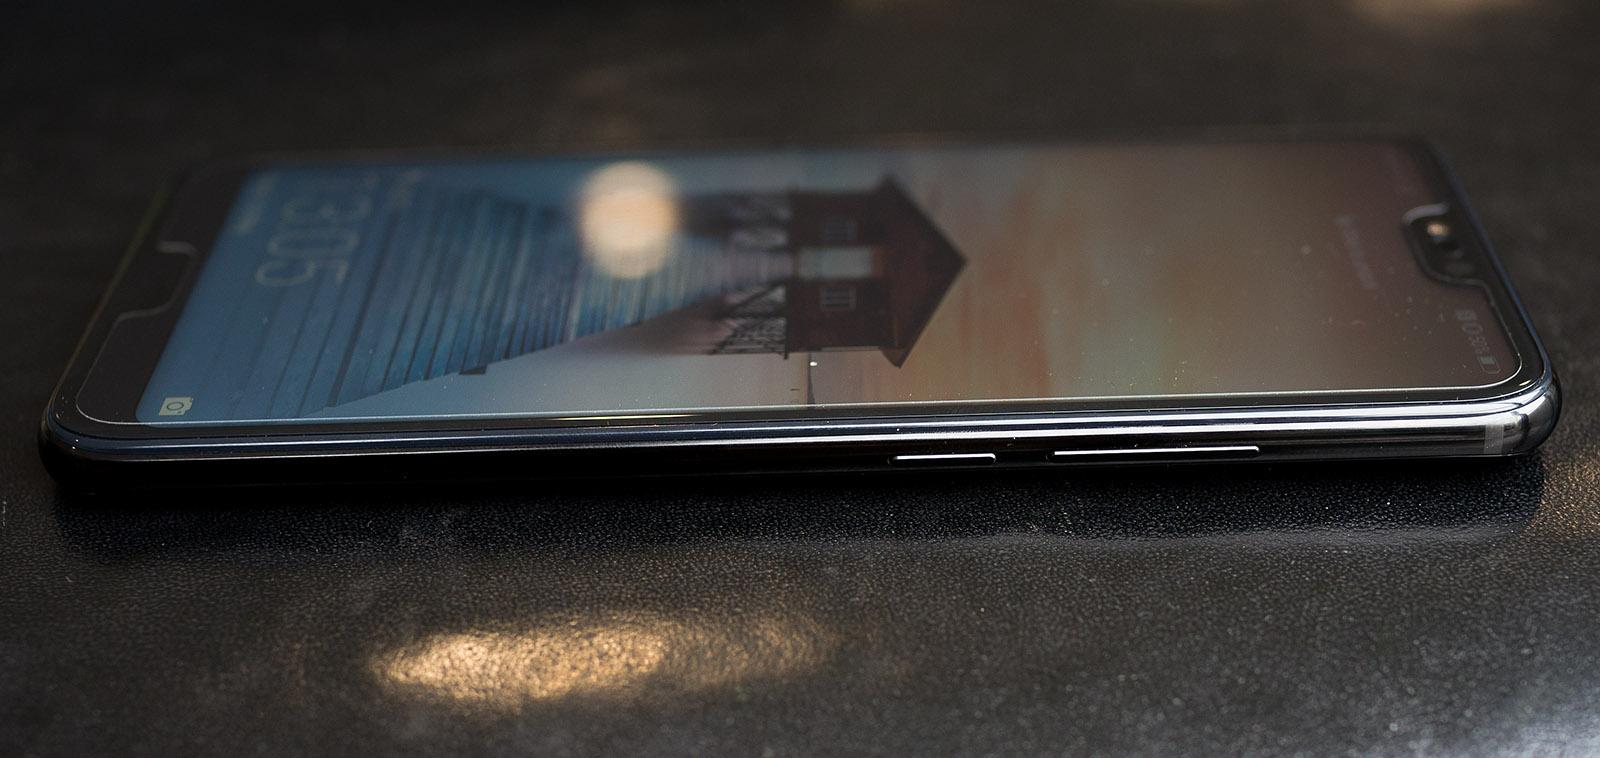 Как фотографирует новый Honor 10. Сравниваем с Huawei P20 и iPhone 7 Plus - 25